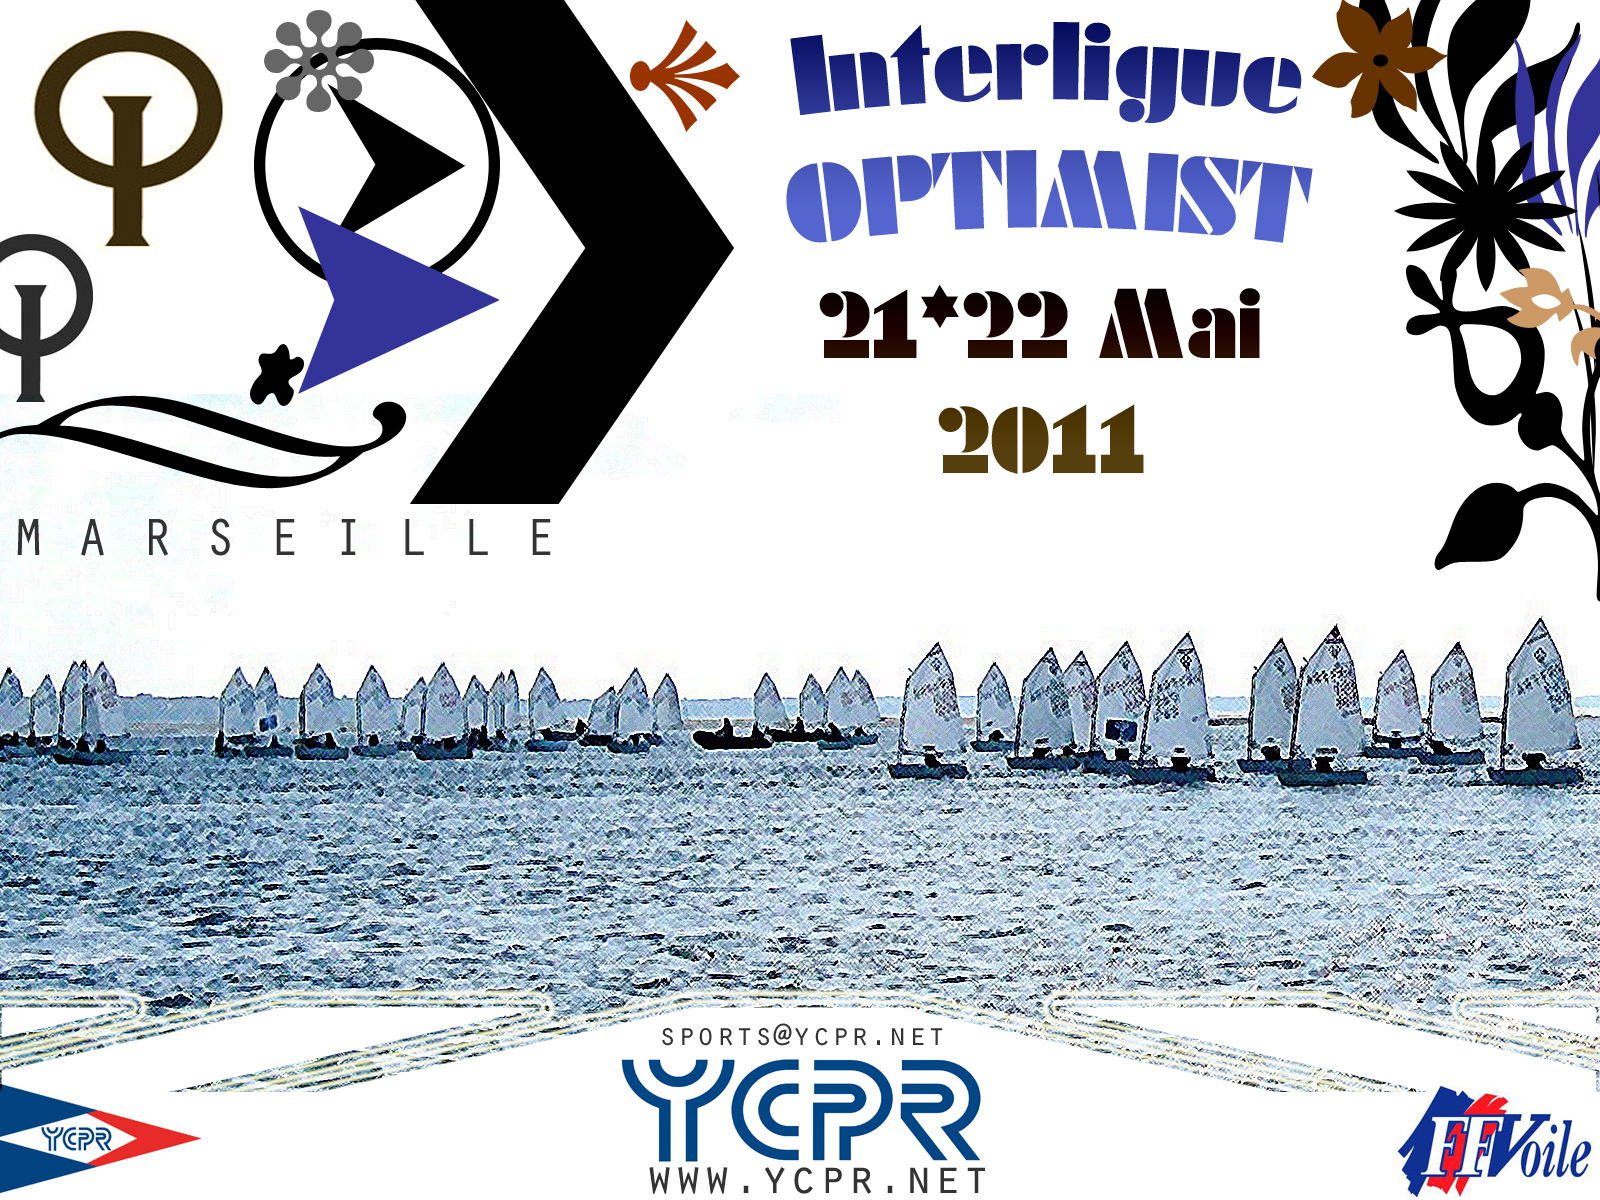 Optist Voile Régate Marseille Génératio-Opti